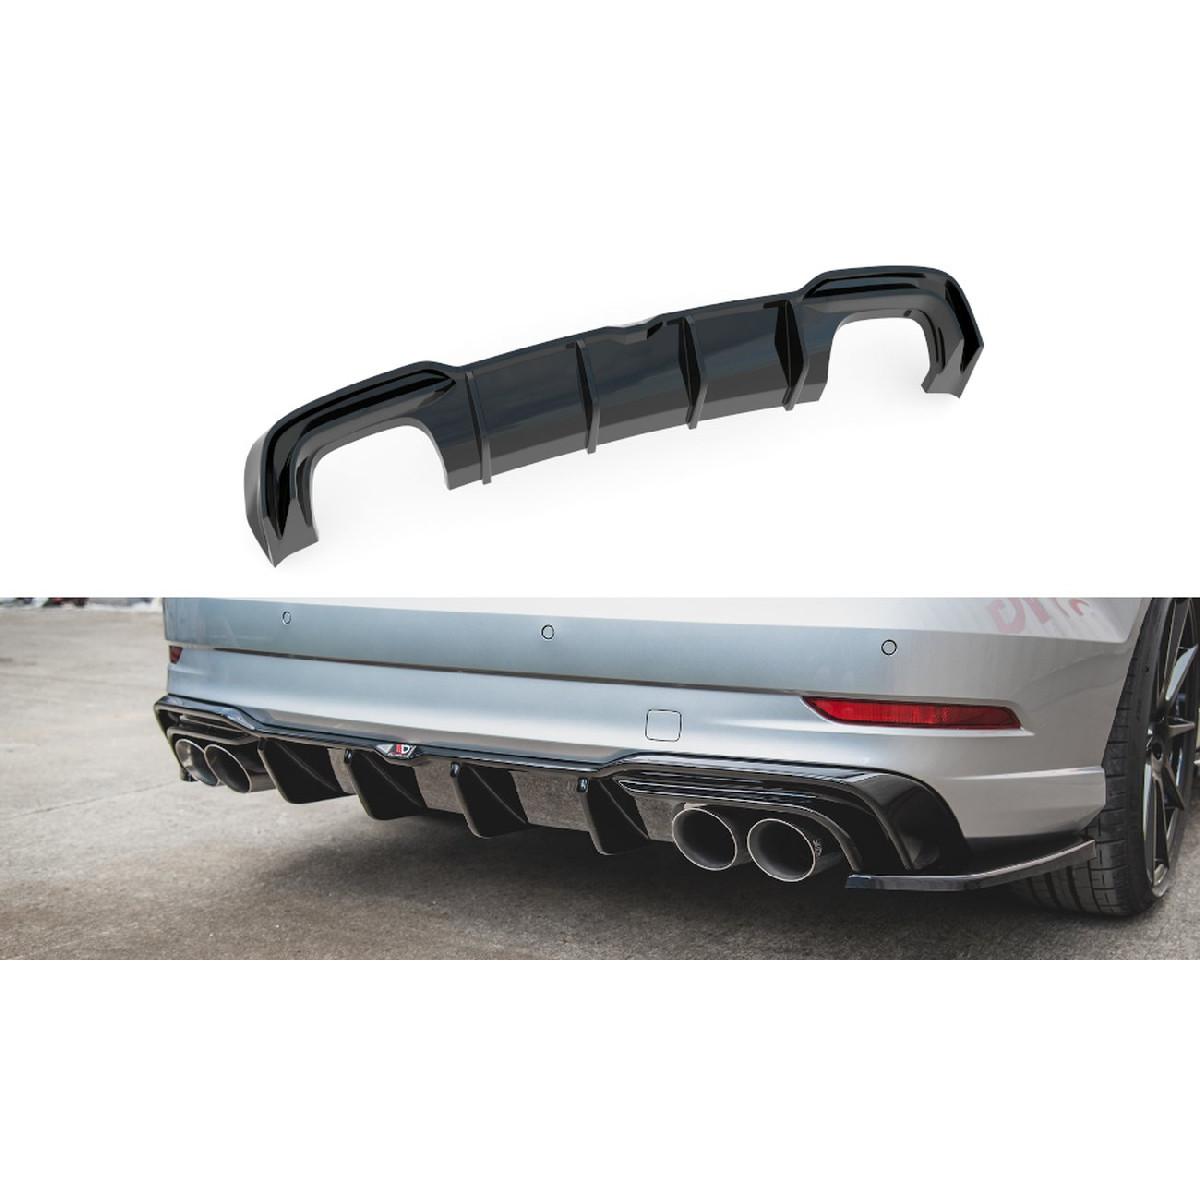 Heck Ansatz Diffusor für Audi S3 Limousine 8V Facelift schwarz matt